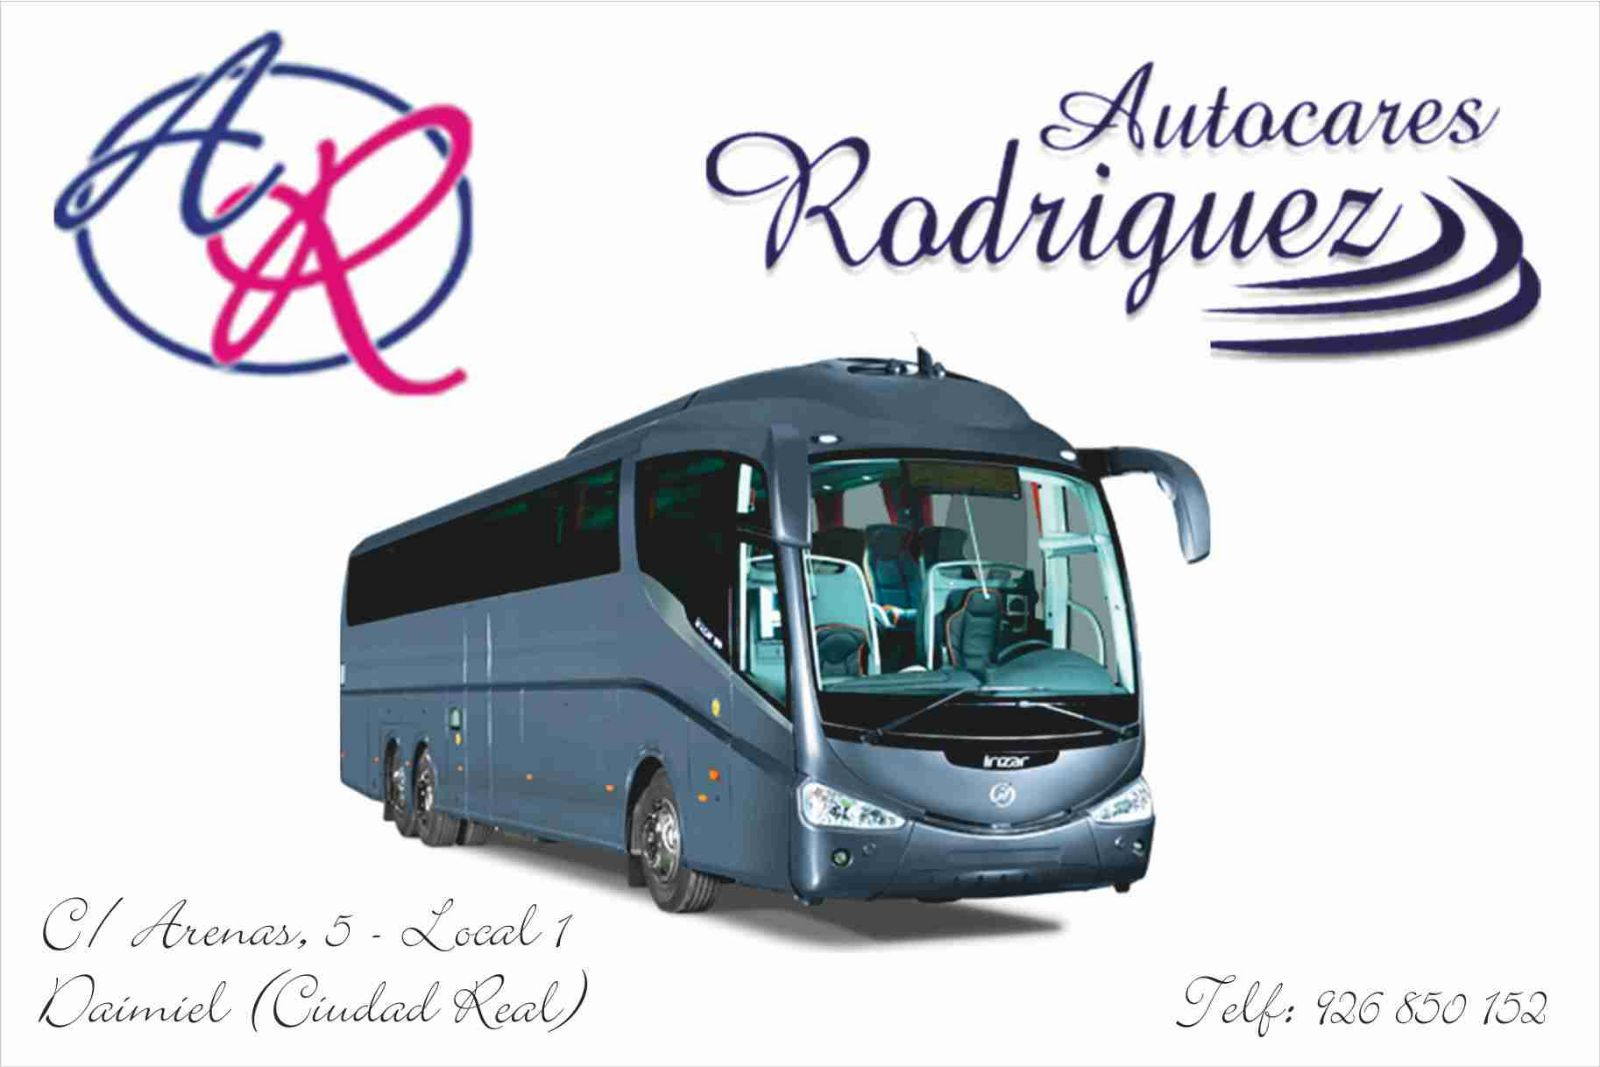 Autocares Rodriguez